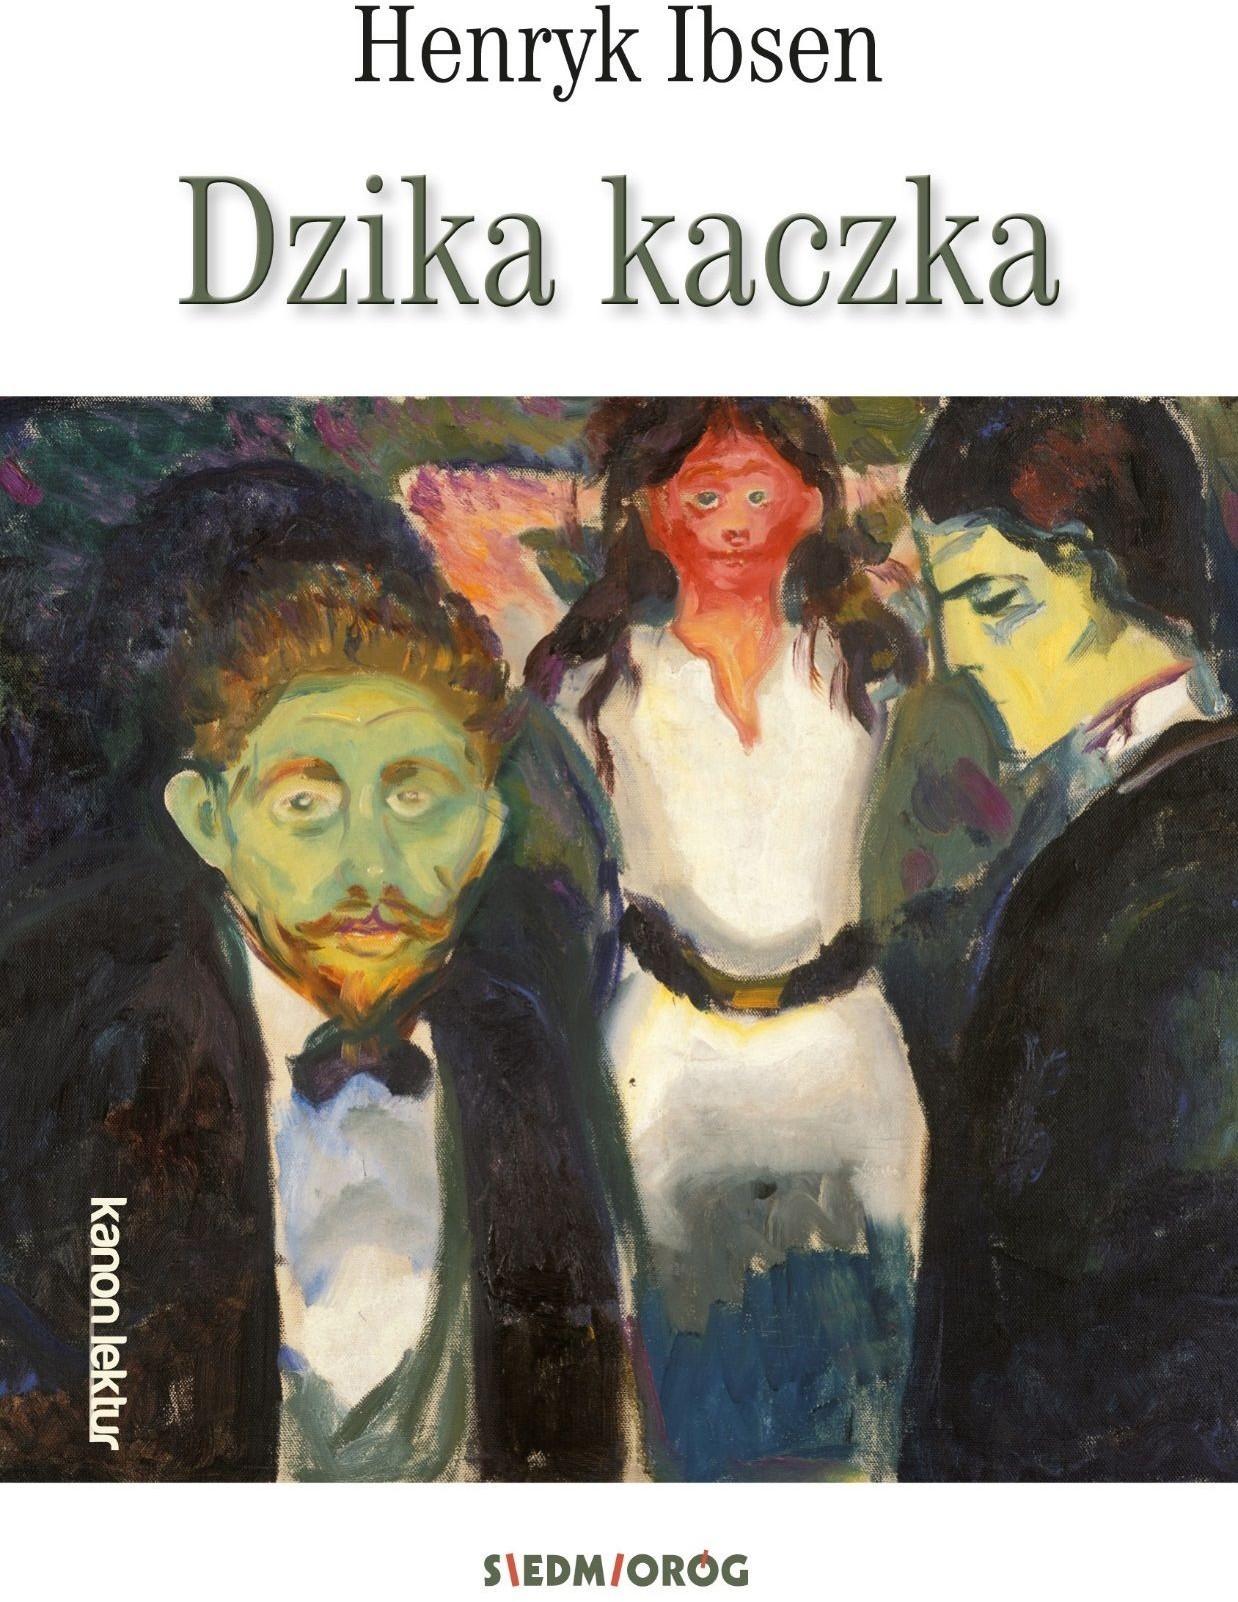 Siedmioróg Dzika kaczka Henryk Ibsen